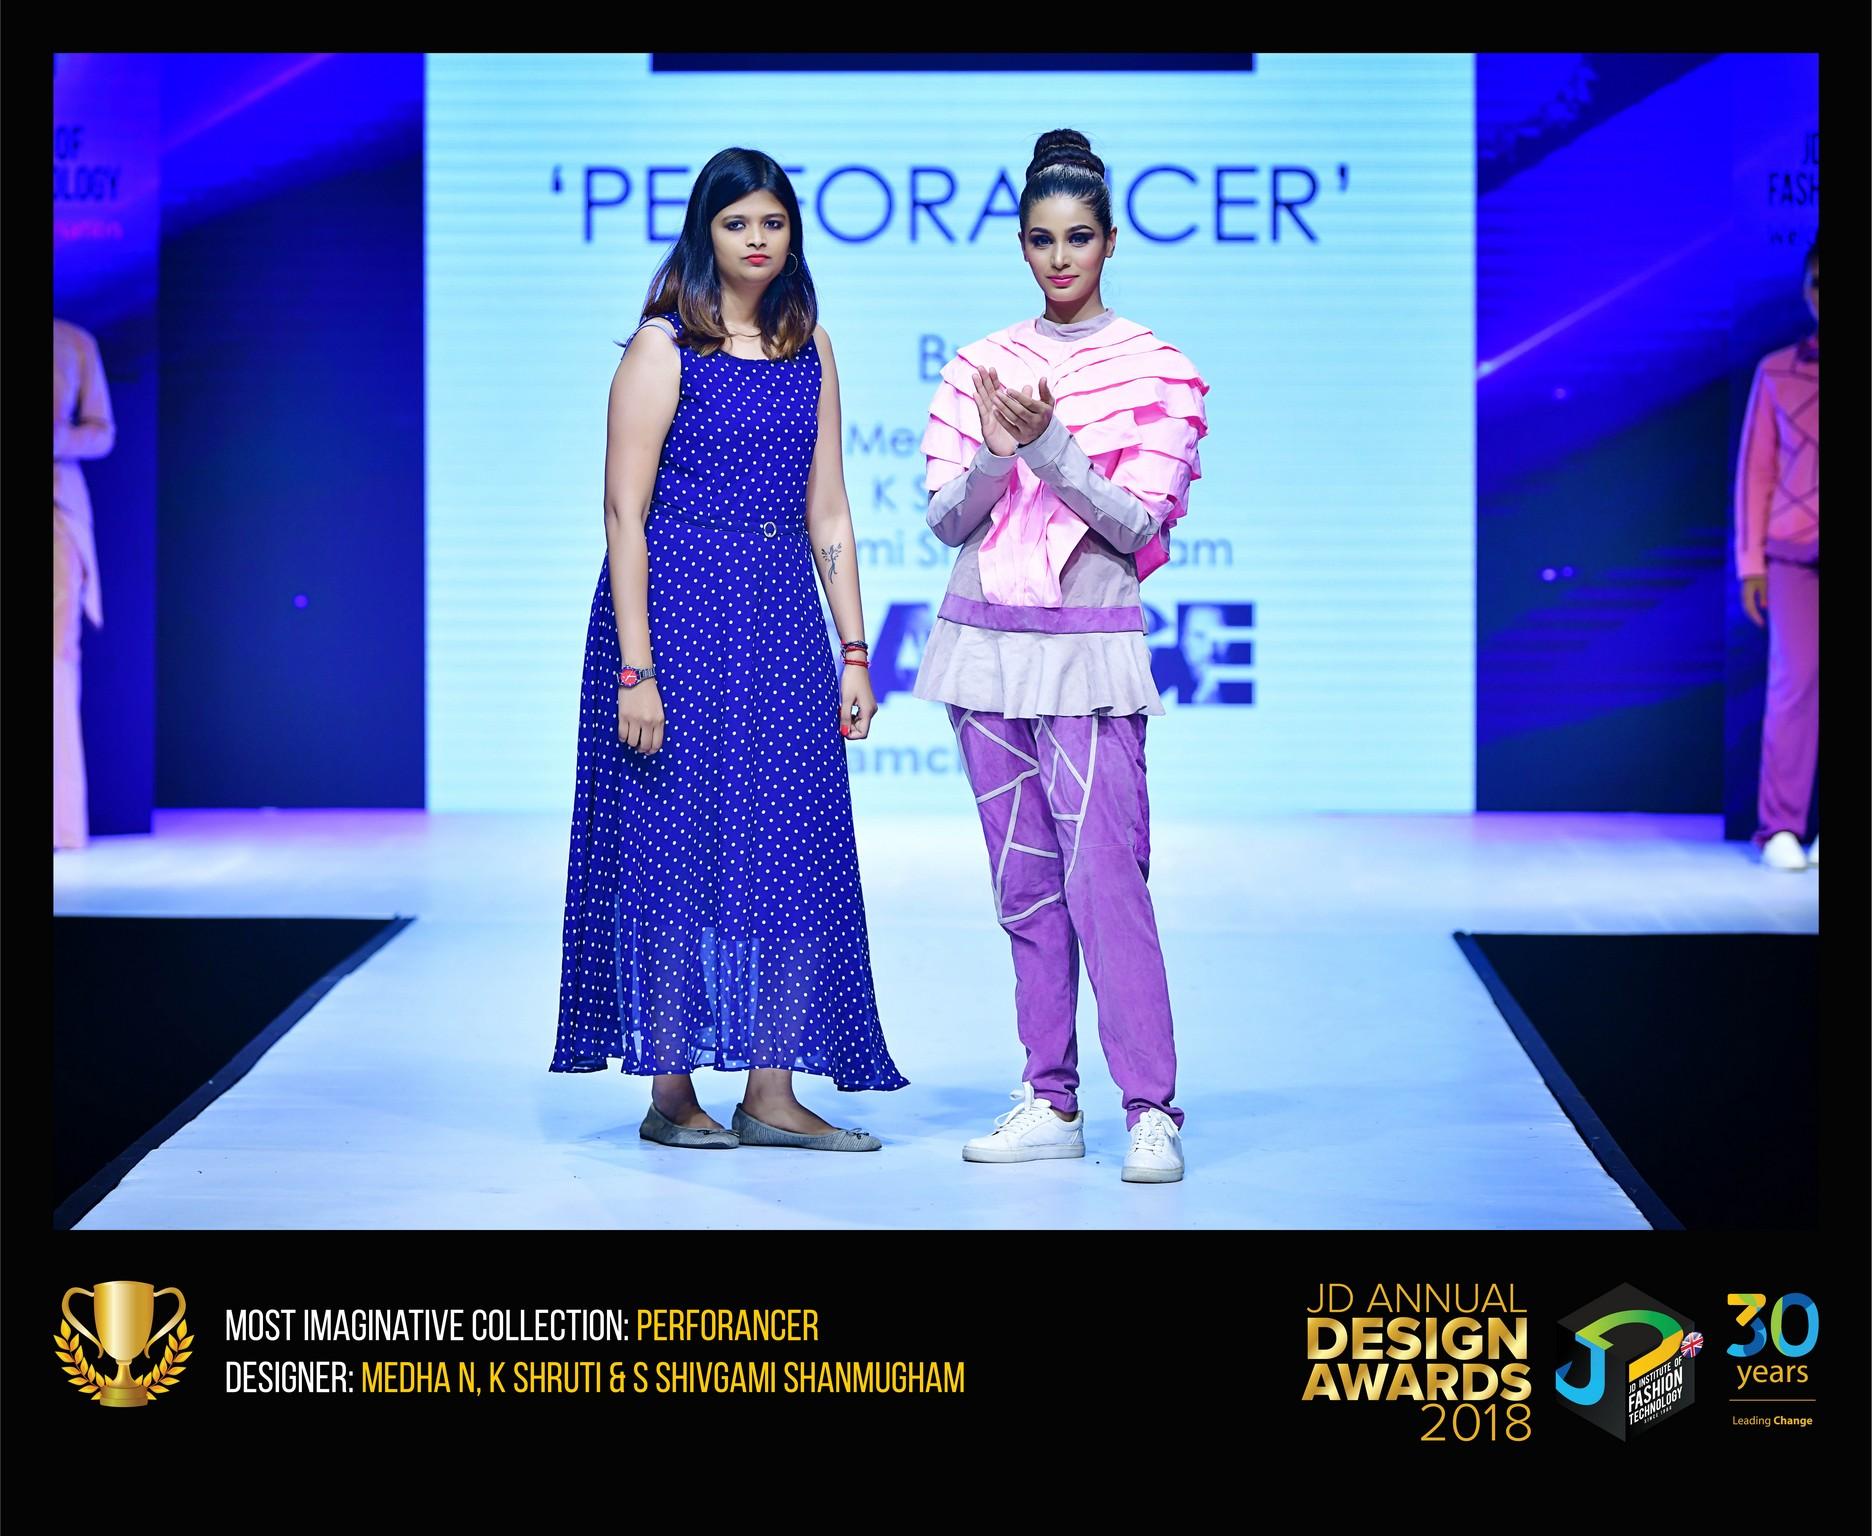 Perforancer – Change – JD Annual Design Awards 2018   Designer: Sohinee, Ravina and Varsha   Photography : Jerin Nath (@jerin_nath) perforancer - PERFORANCERfinal - Perforancer – Change – JD Annual Design Awards 2018